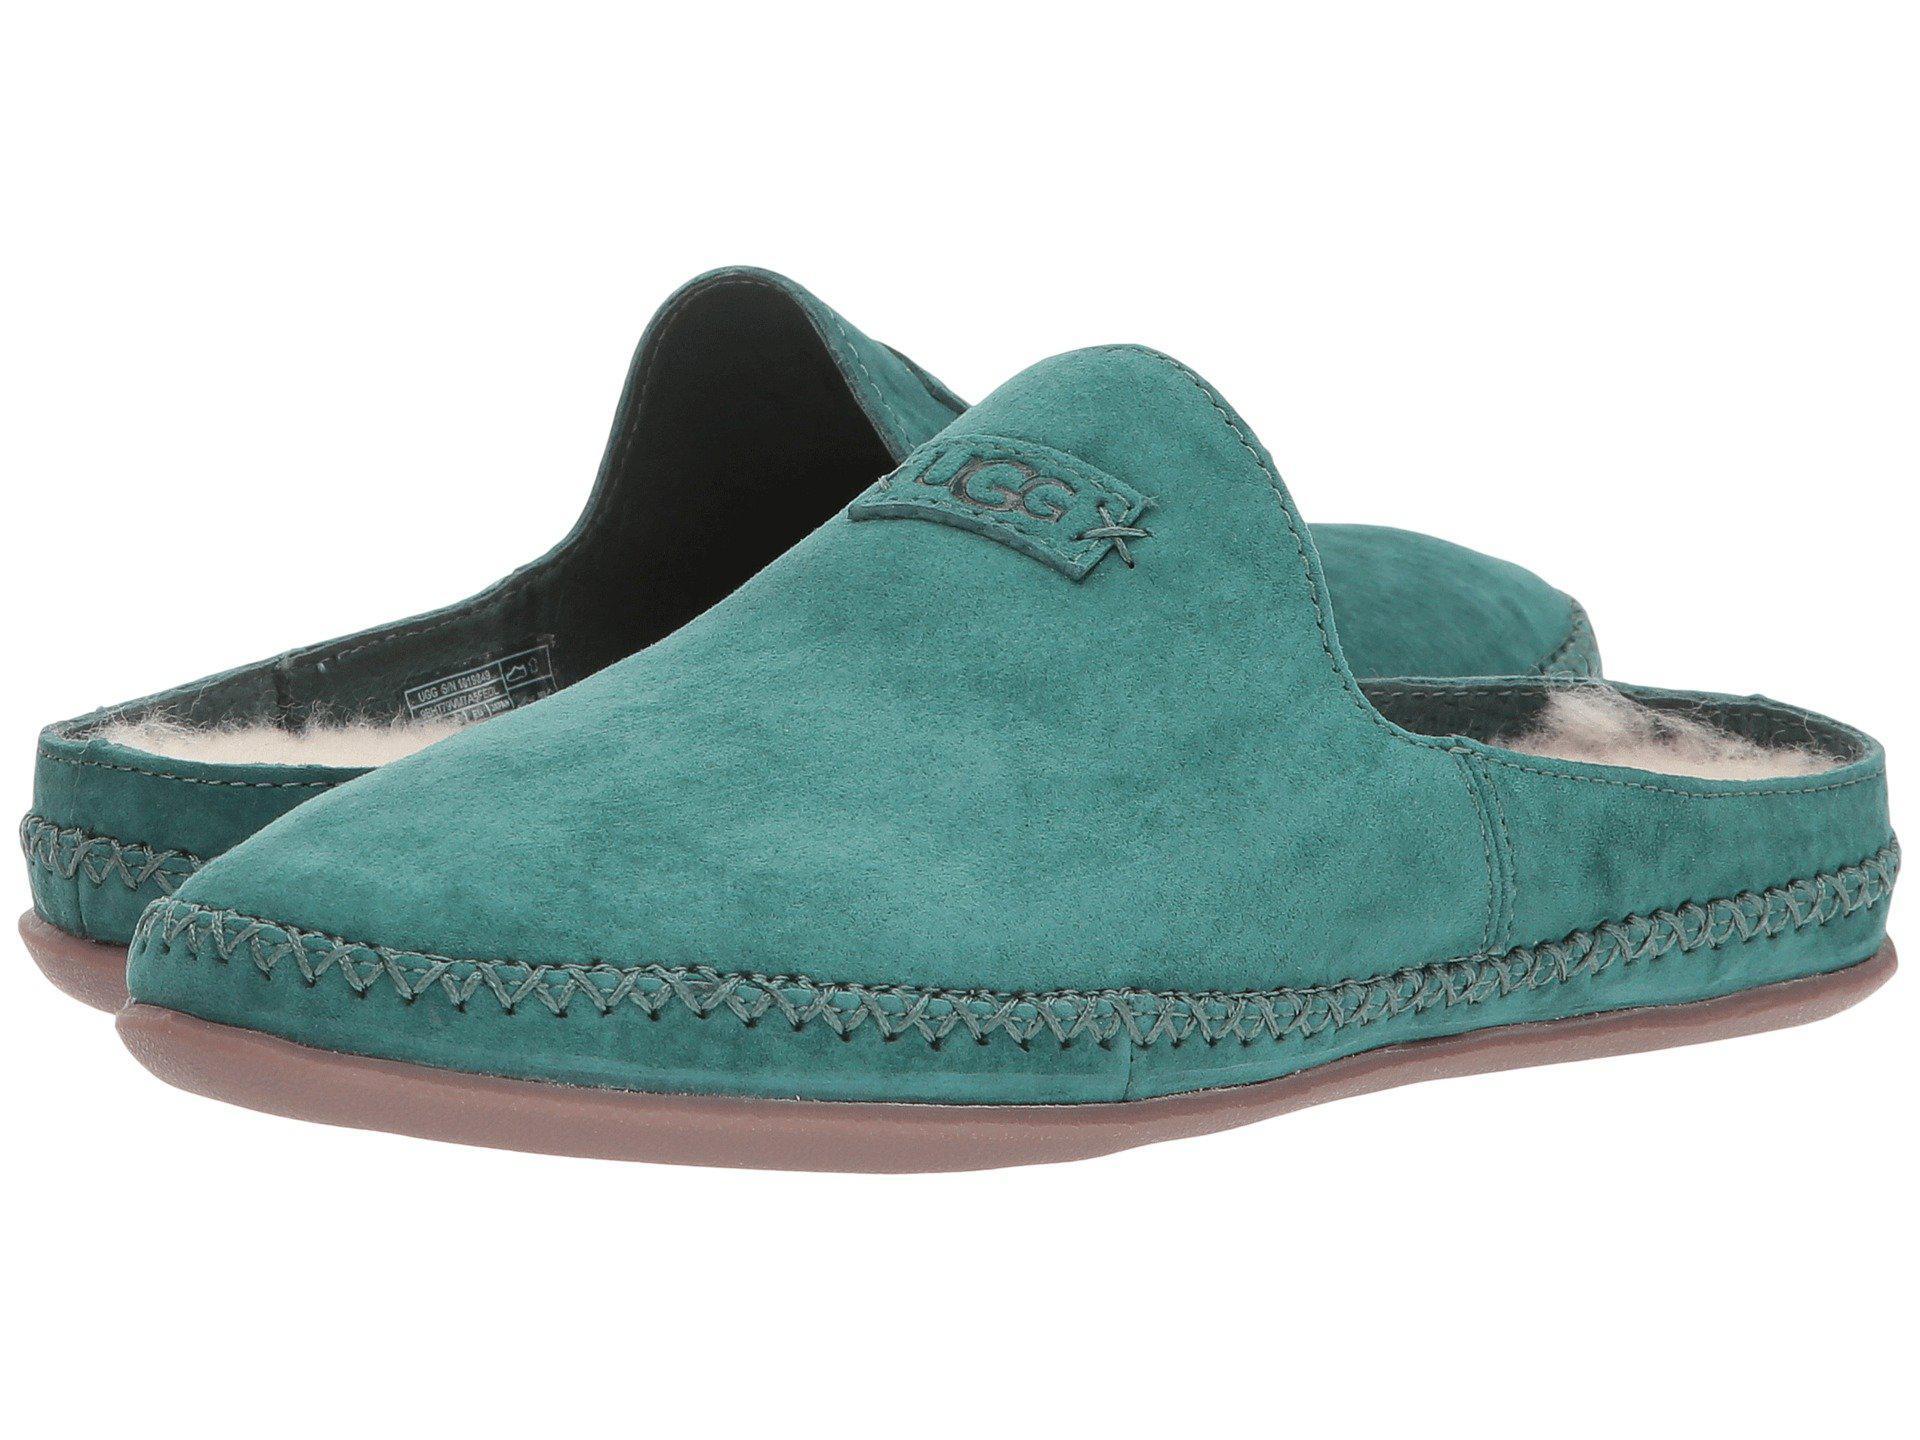 37063925570 UGG Tamara (chestnut 1) Women's Slippers in Green - Lyst